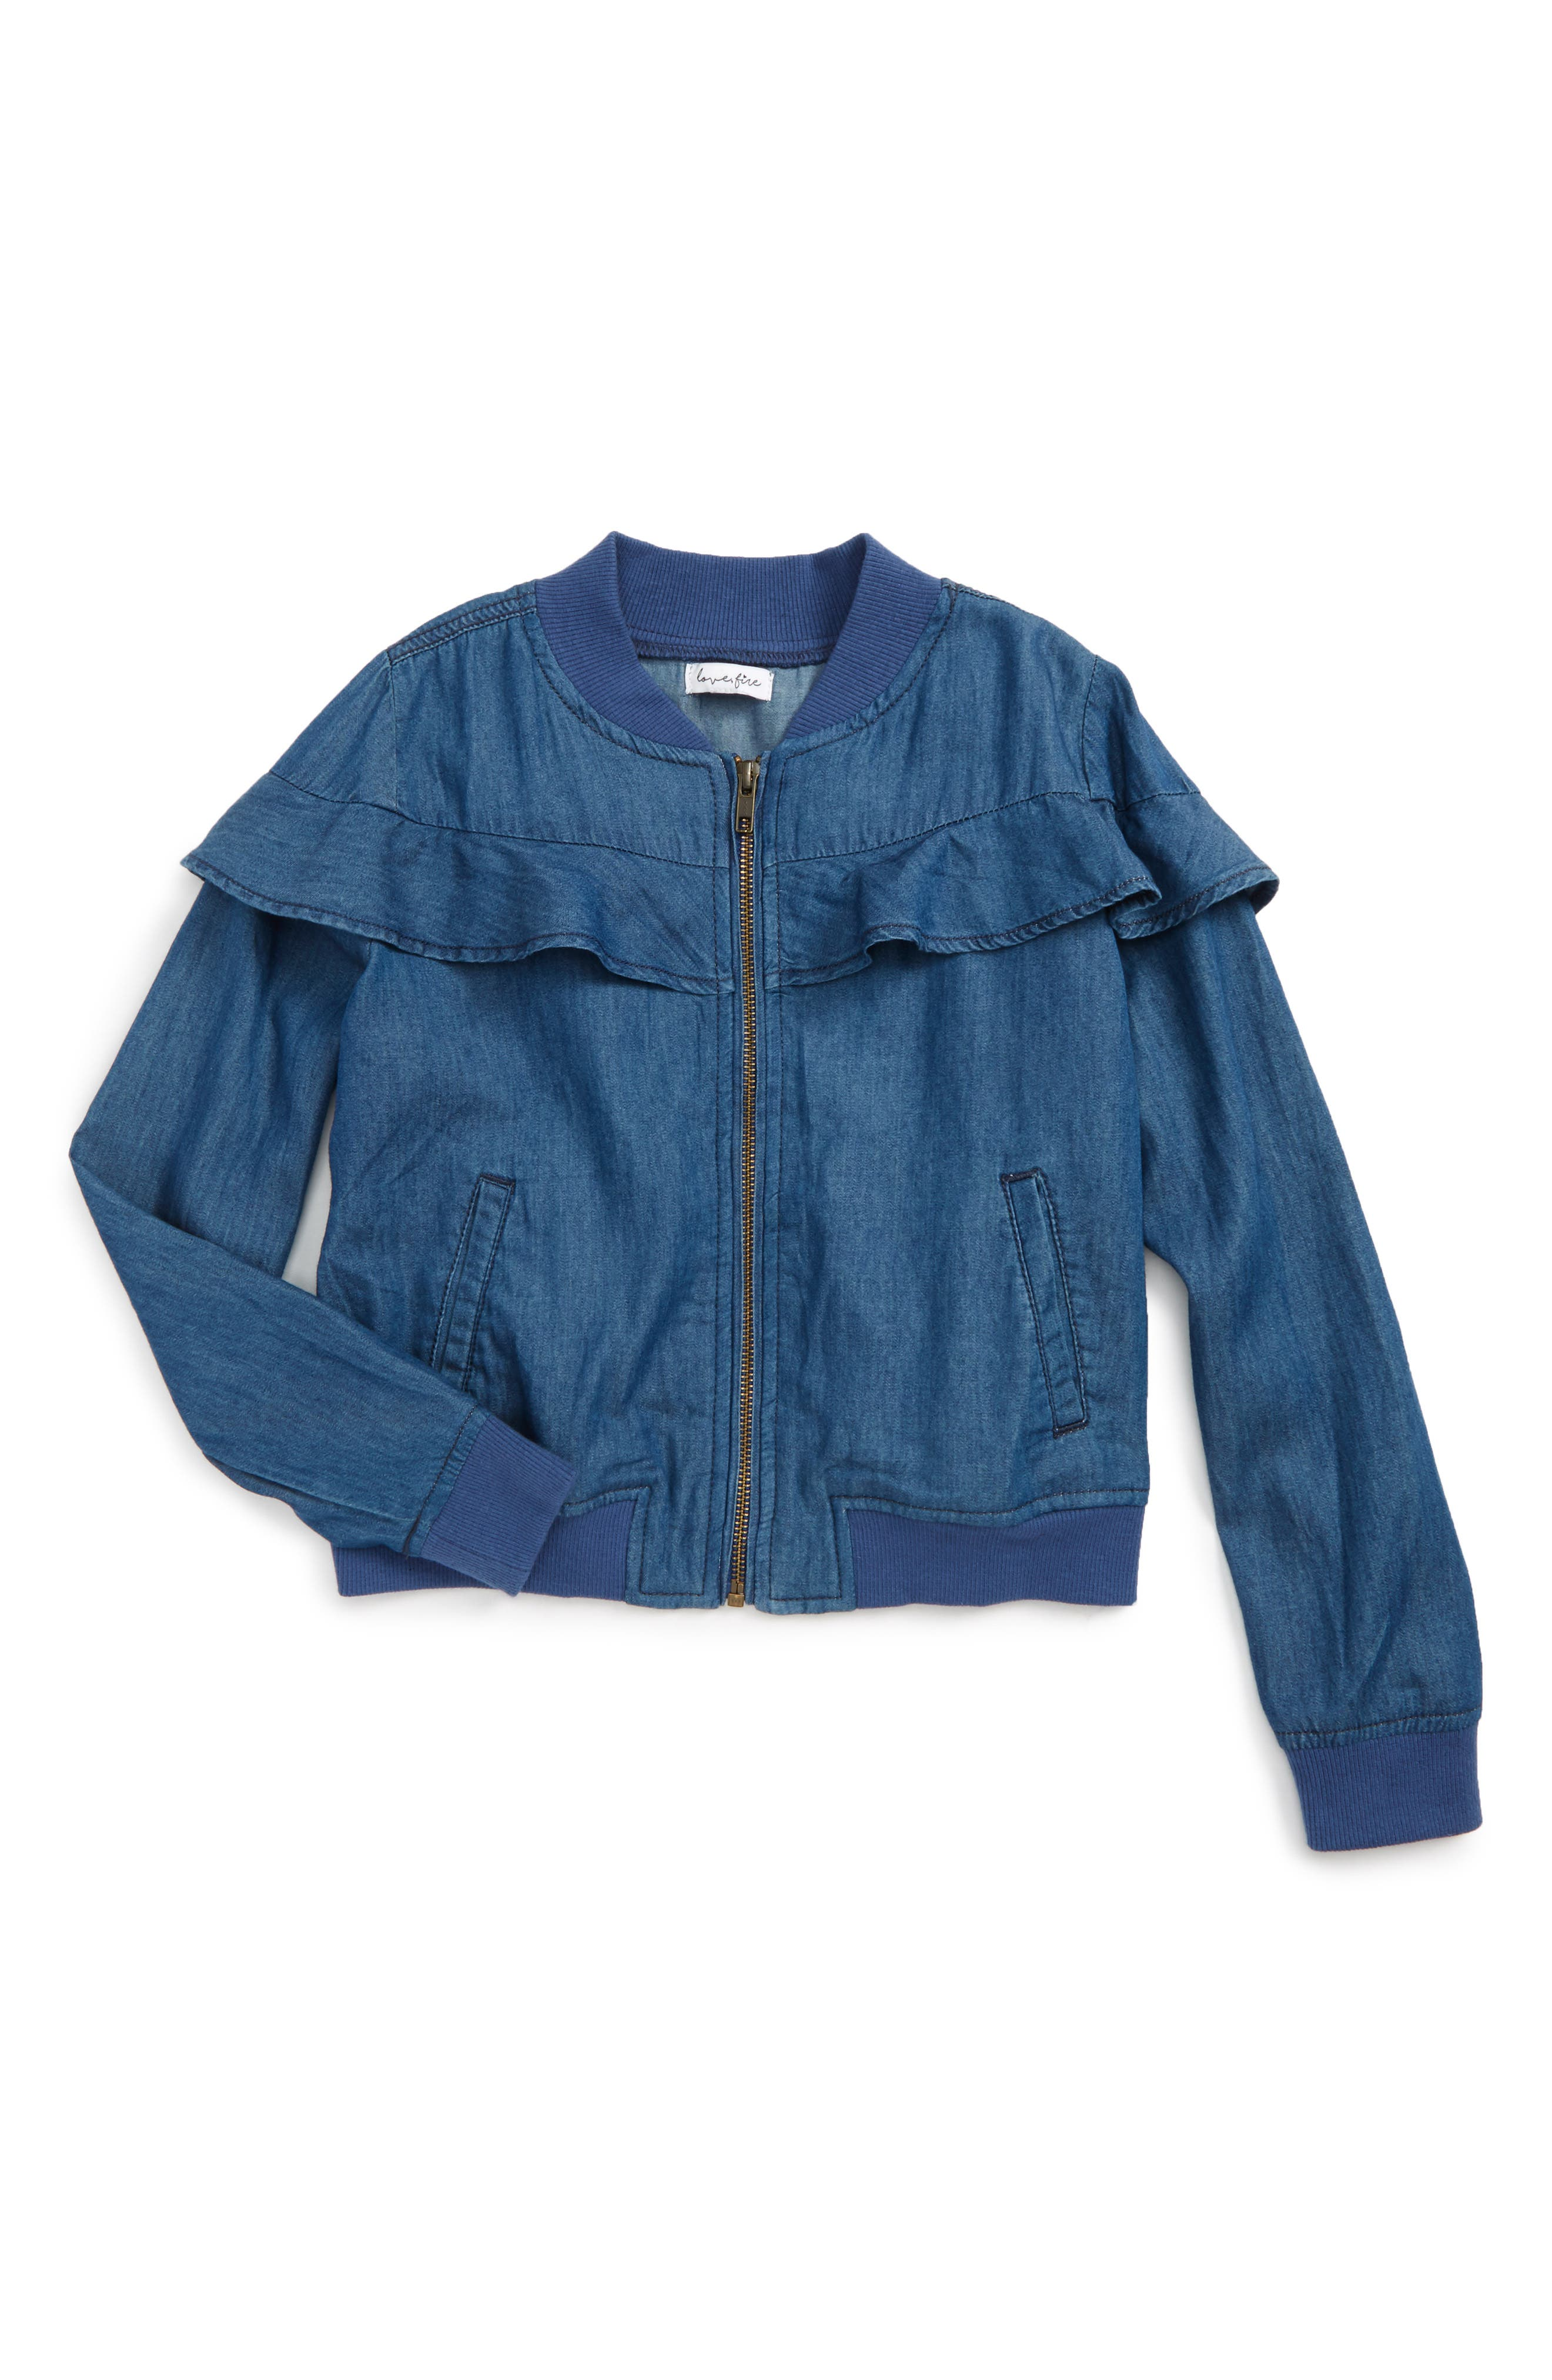 Ruffle Denim Jacket,                         Main,                         color, 426